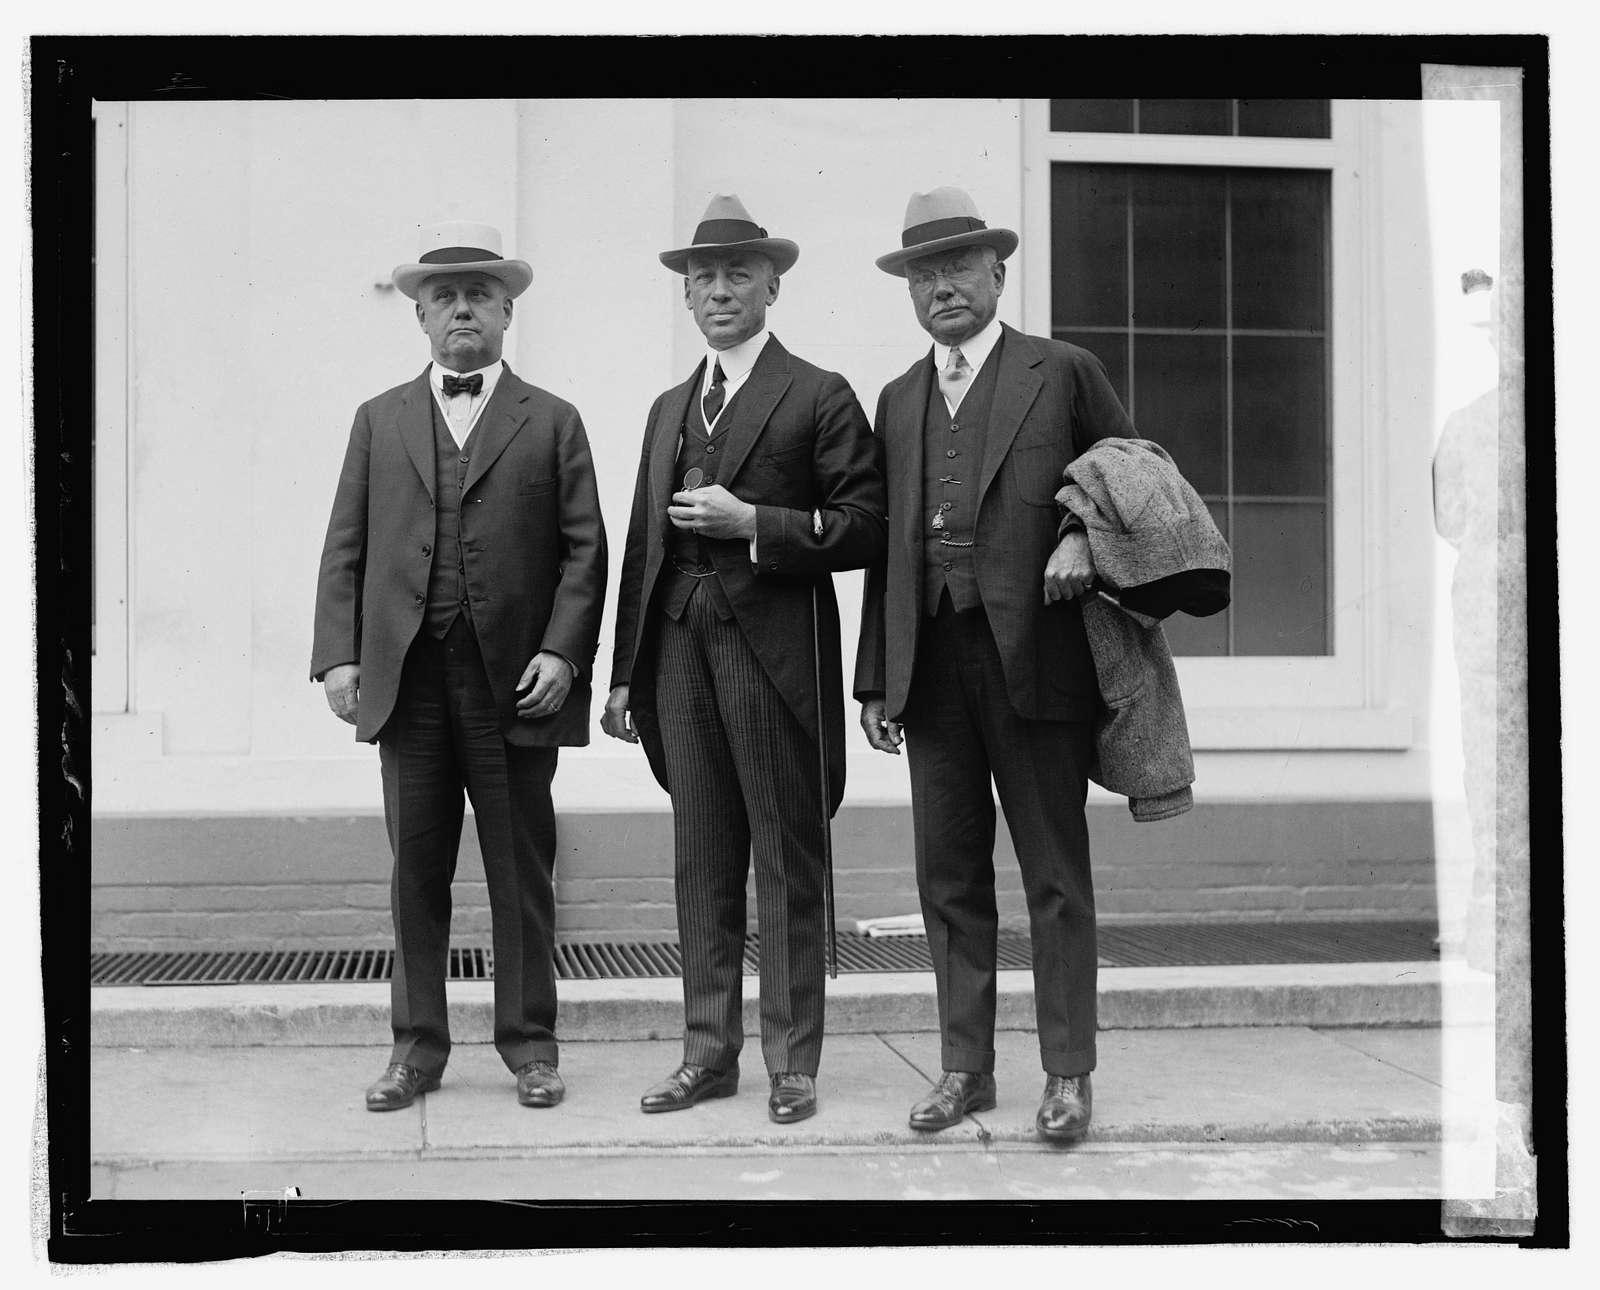 Cong. Wm. S. Vare, Mayor W. Freeland, Kendrick, Chas. B. Hall at White House, 924